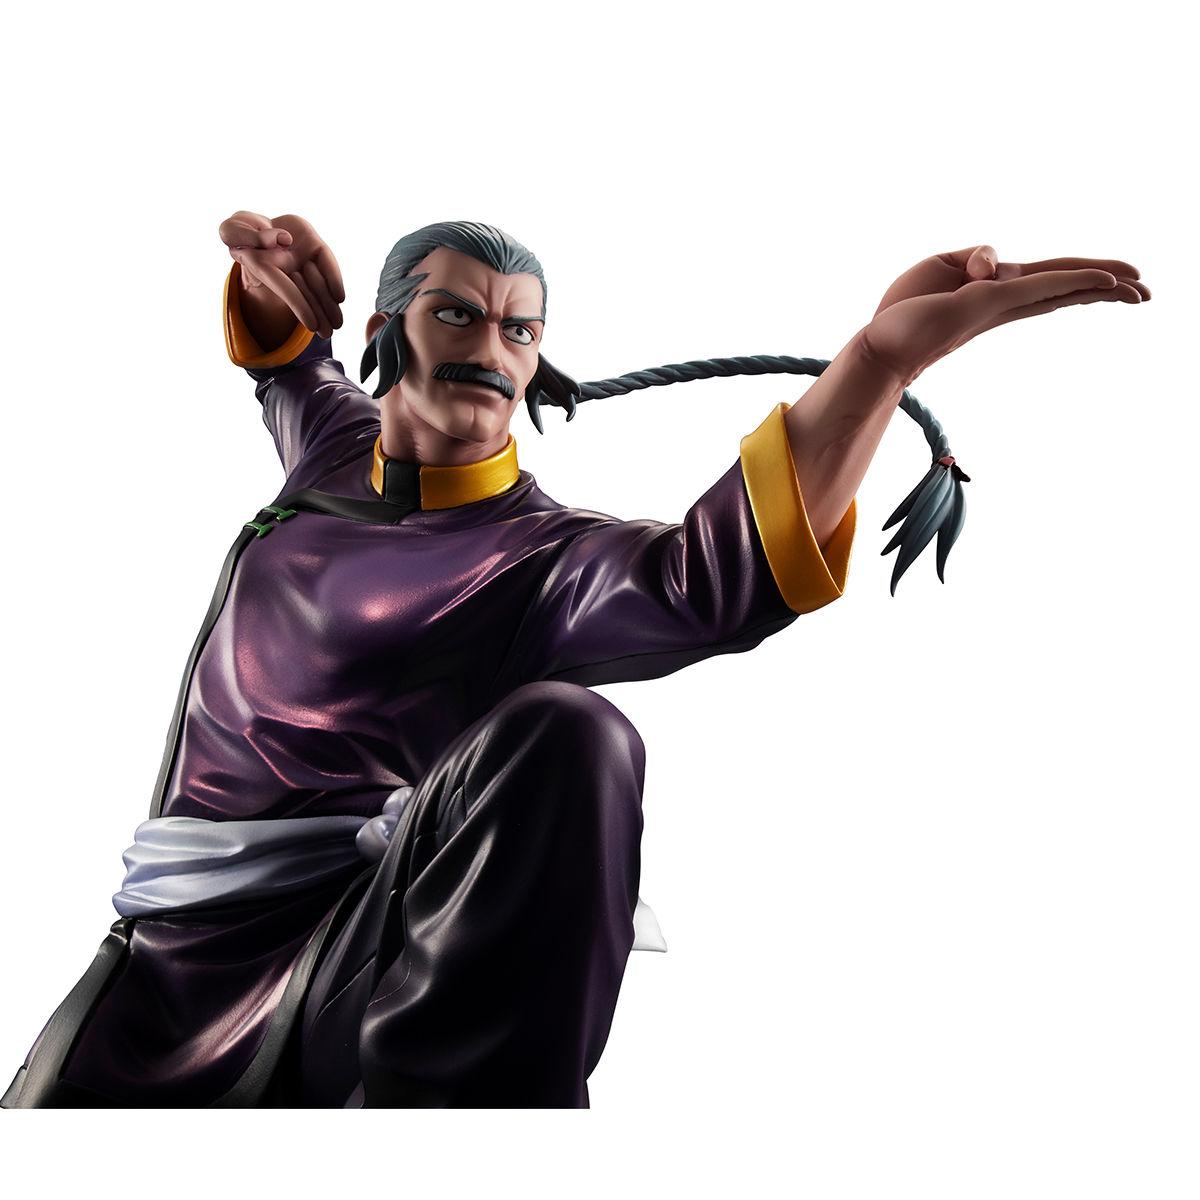 GGG『マスターアジア』機動武闘伝Gガンダム 完成品フィギュア-008